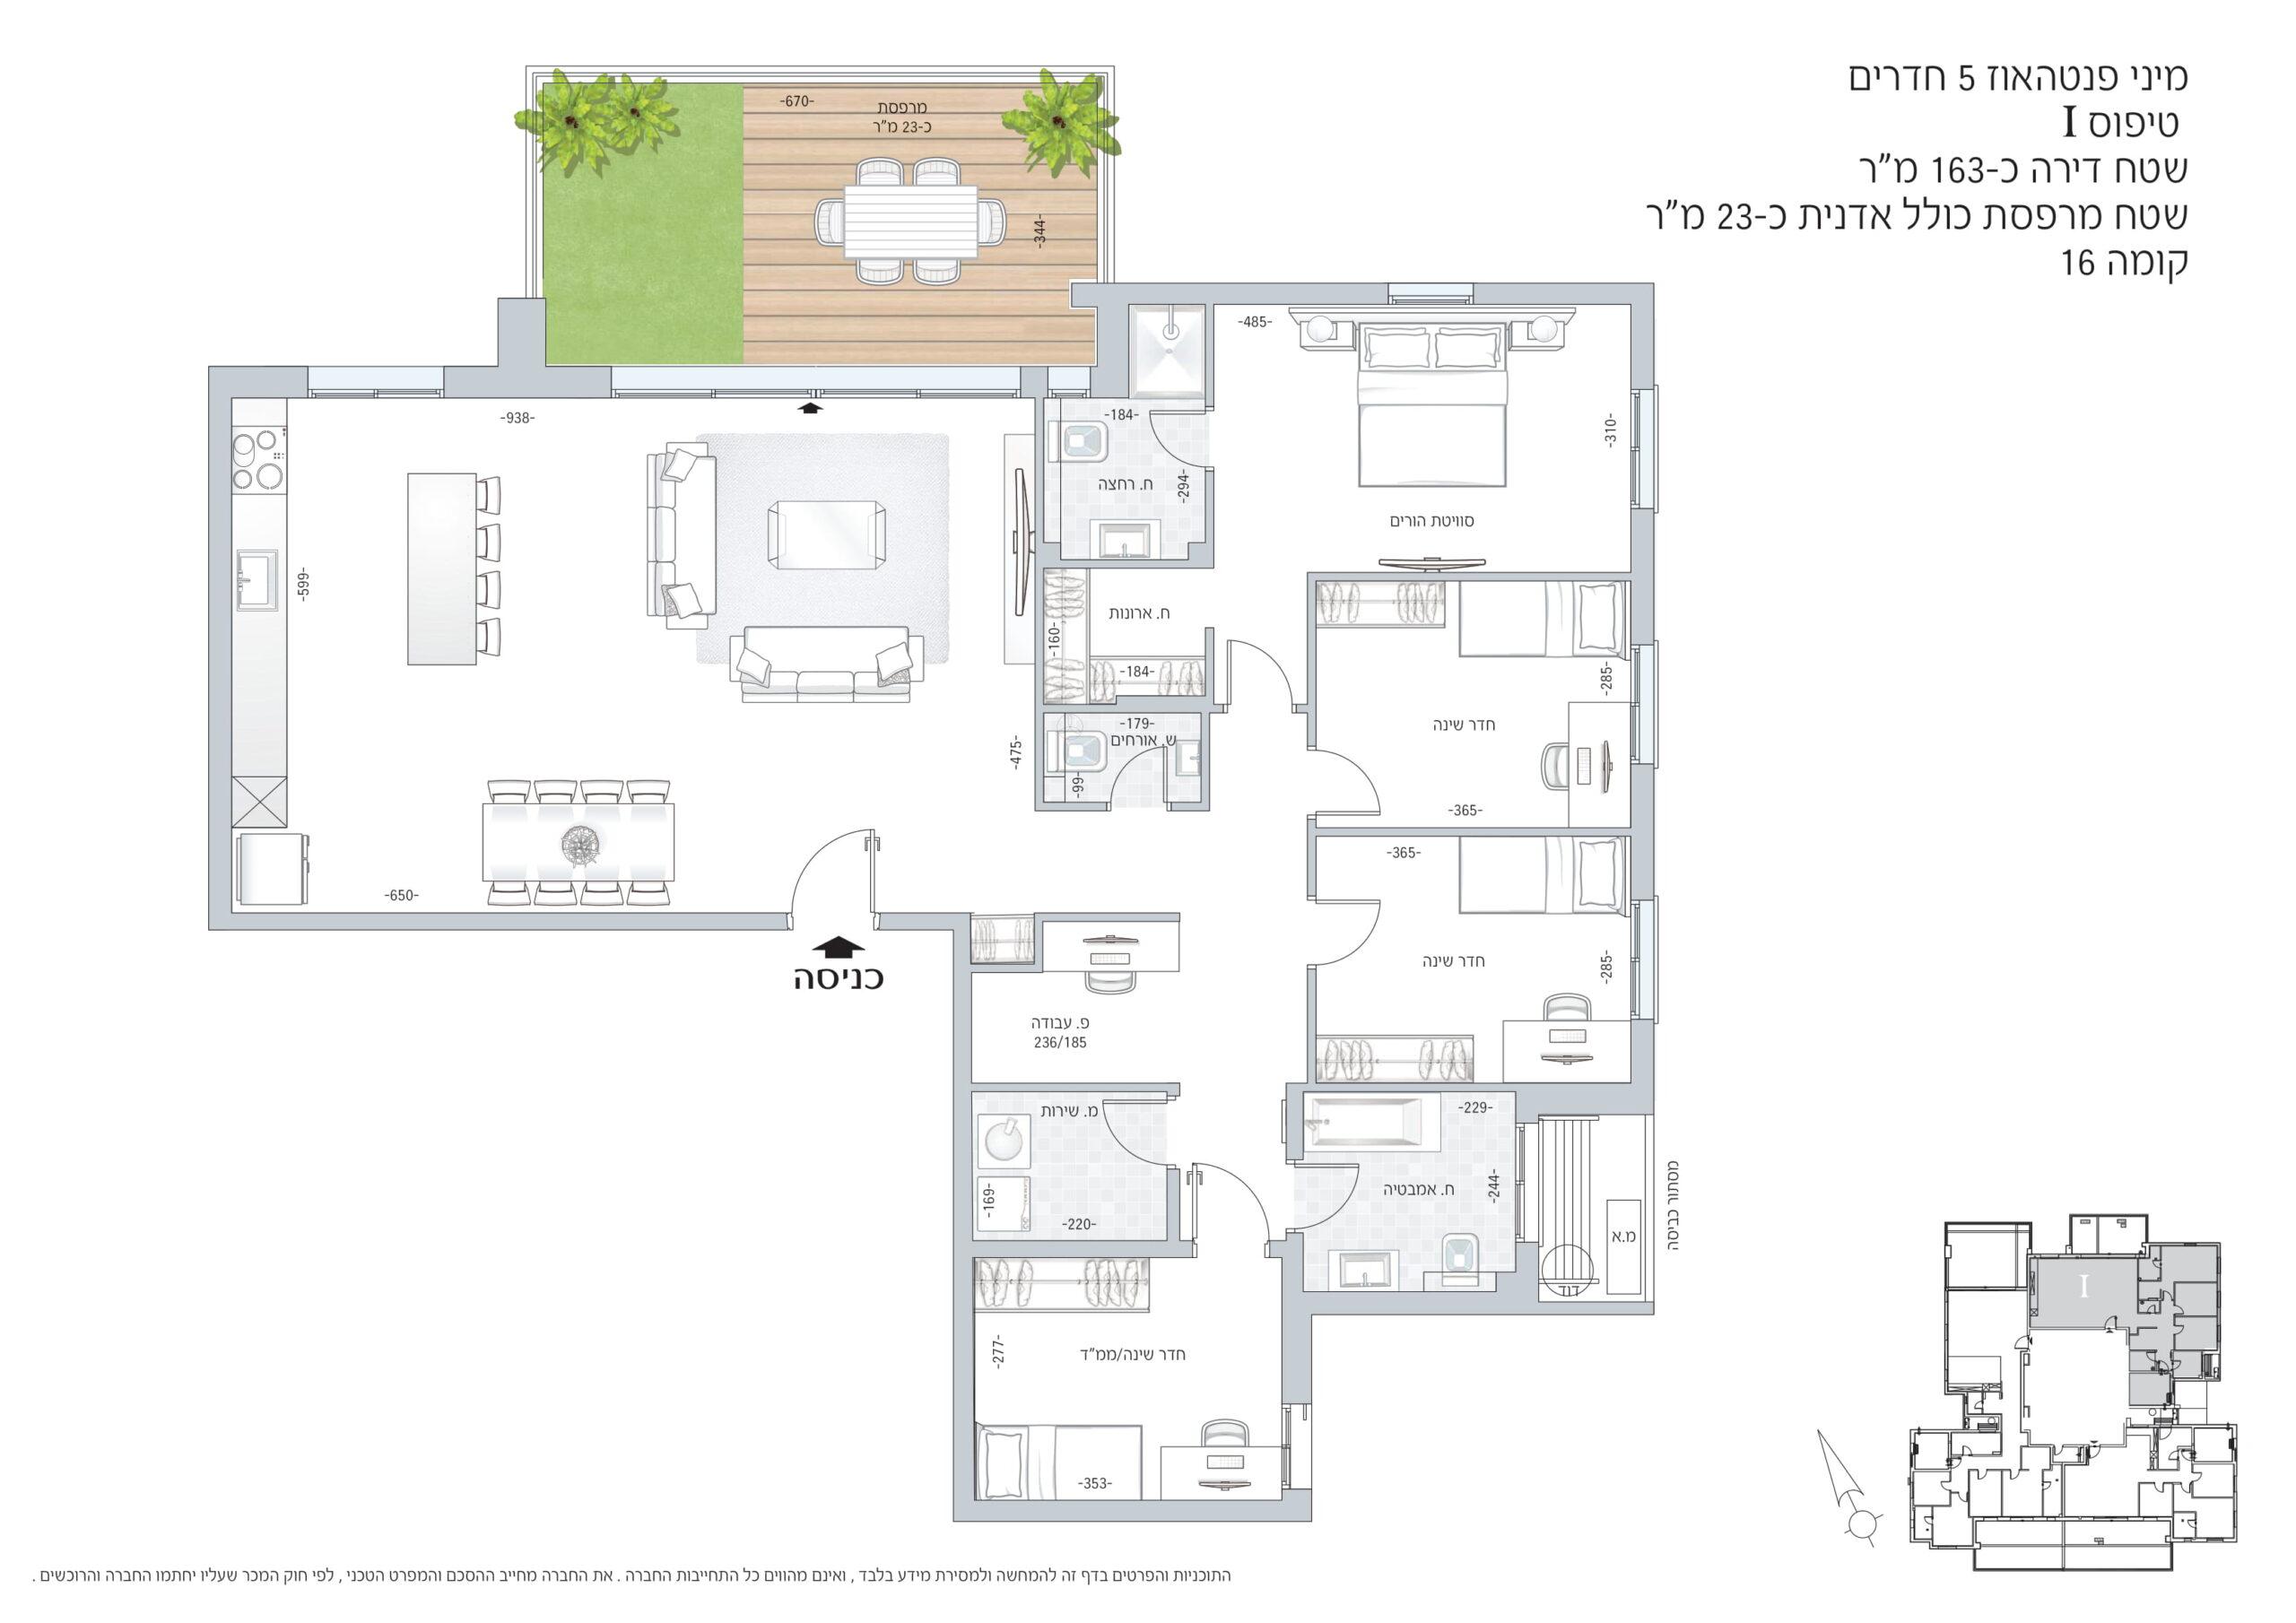 תכנית דירה מיני פנט' 5 חד'